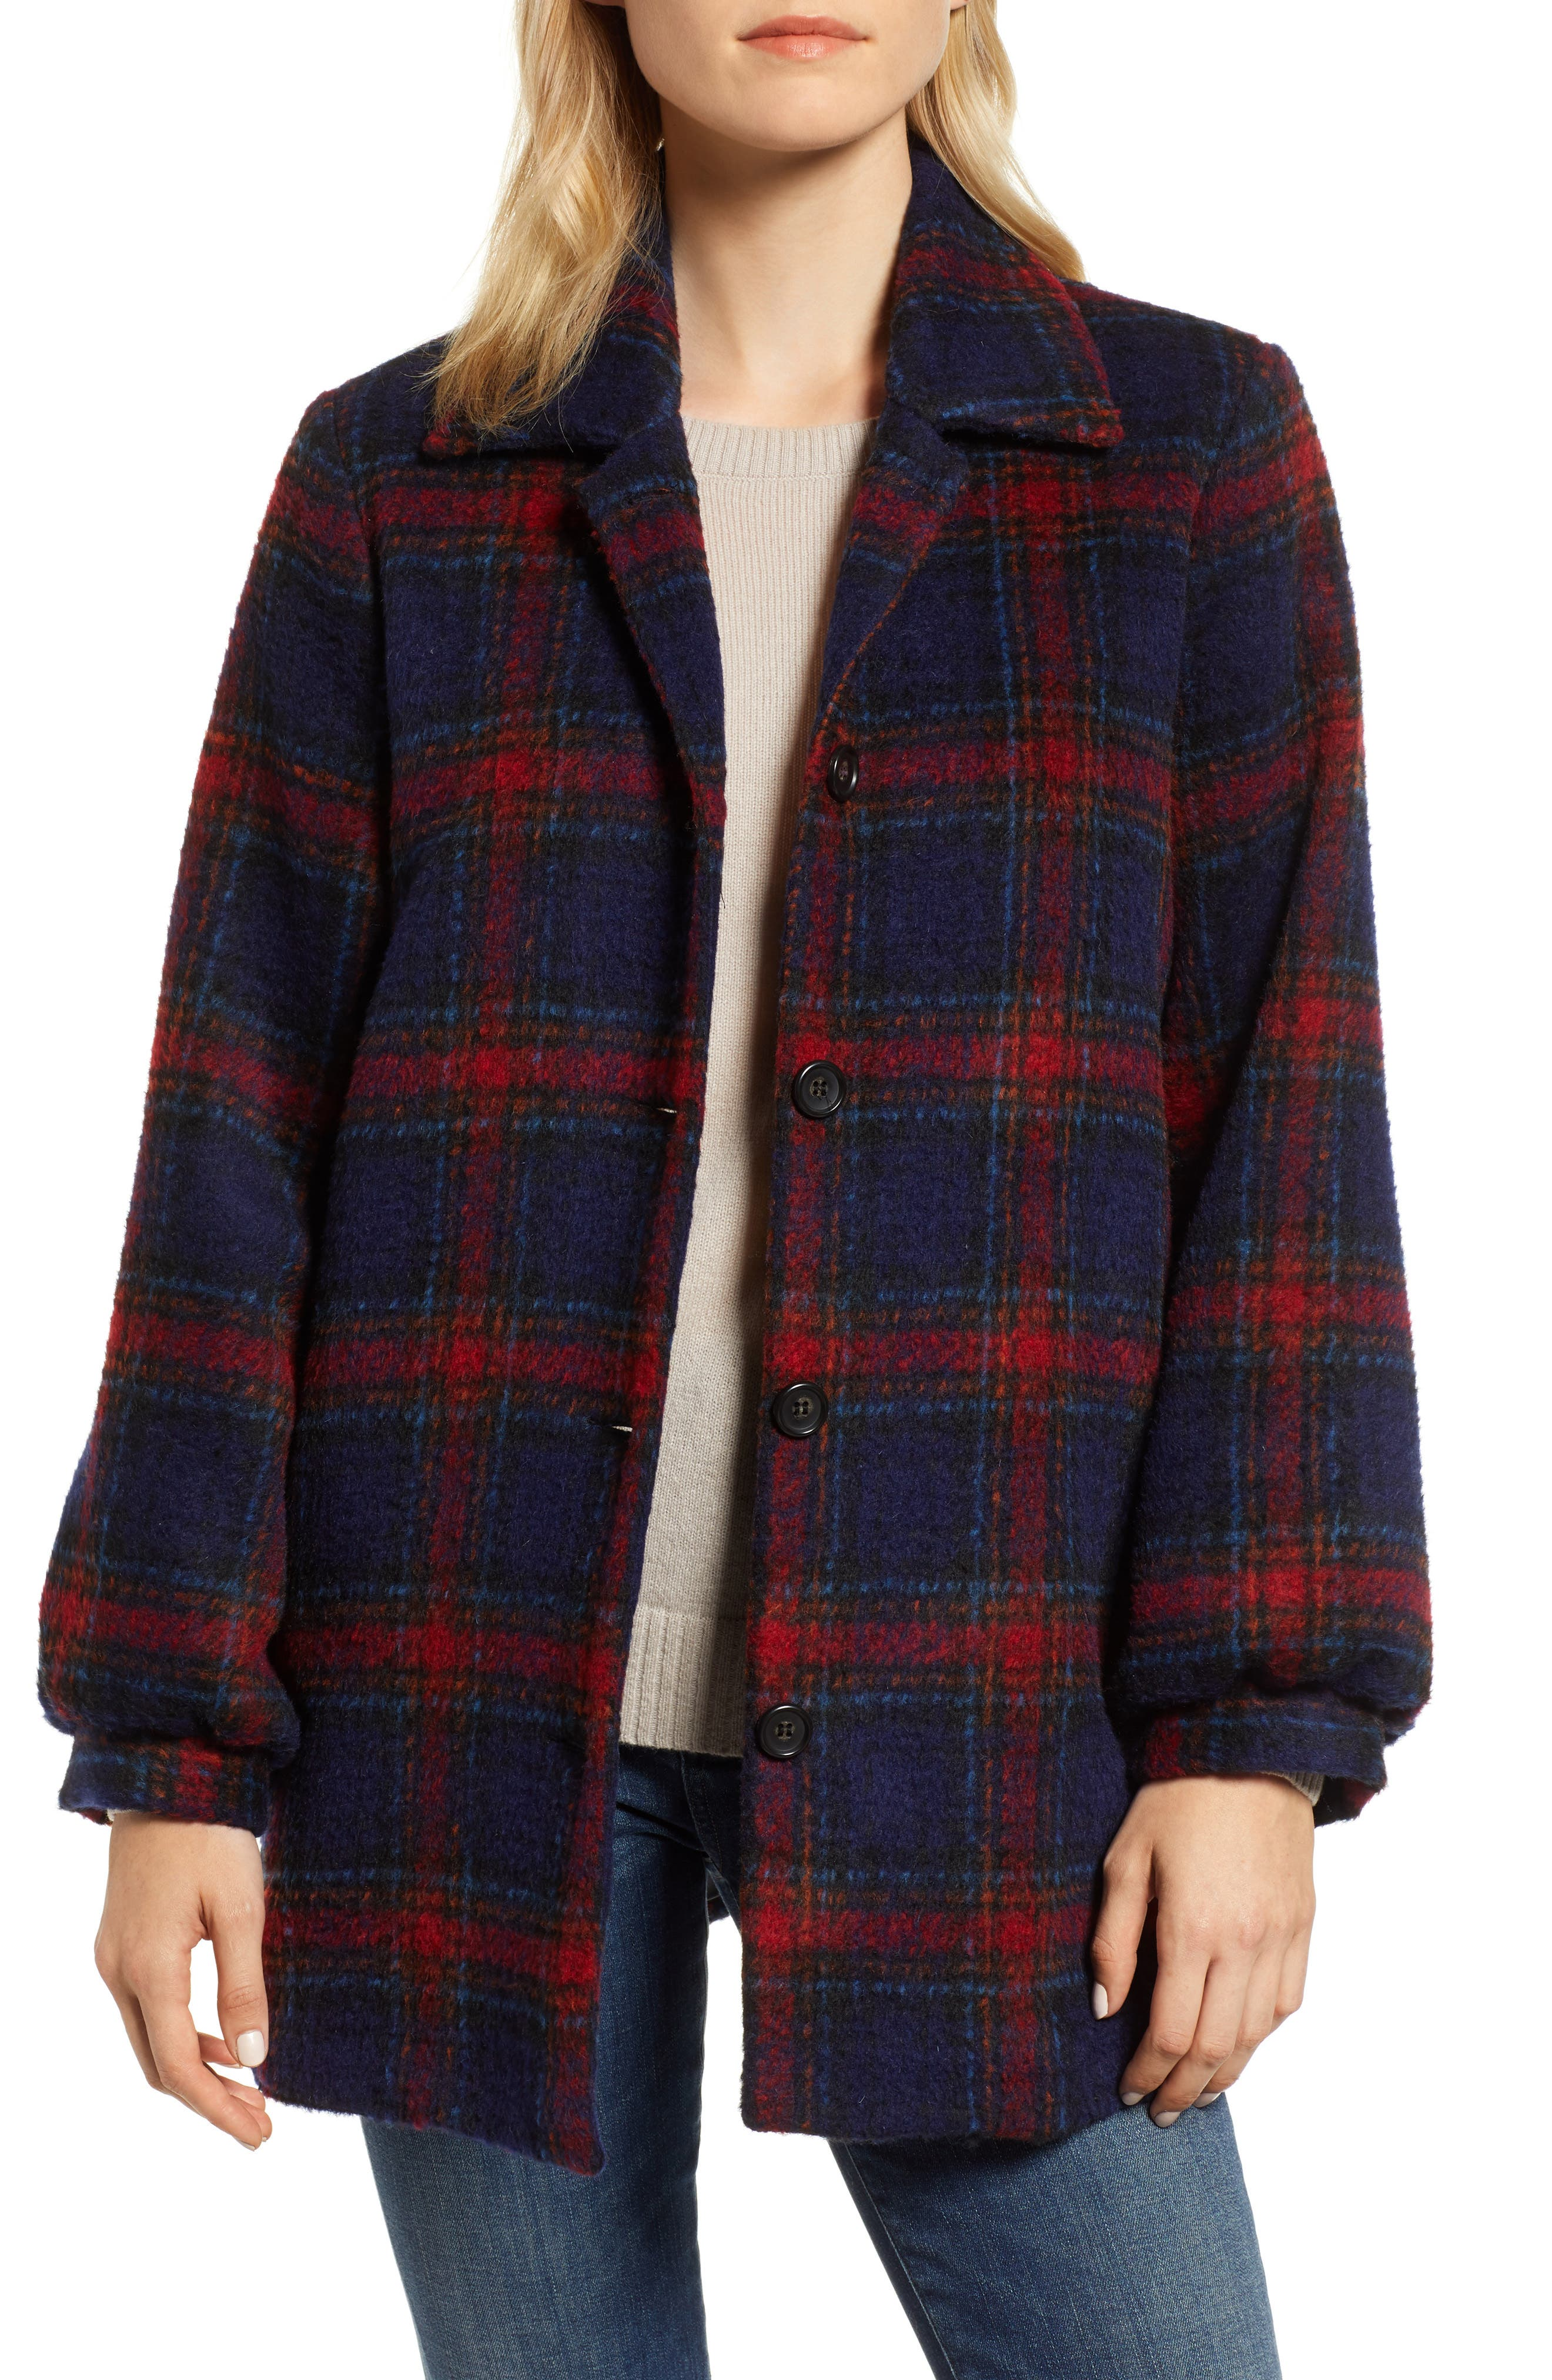 Plaid Wool Blend Jacket,                             Main thumbnail 1, color,                             MULTI